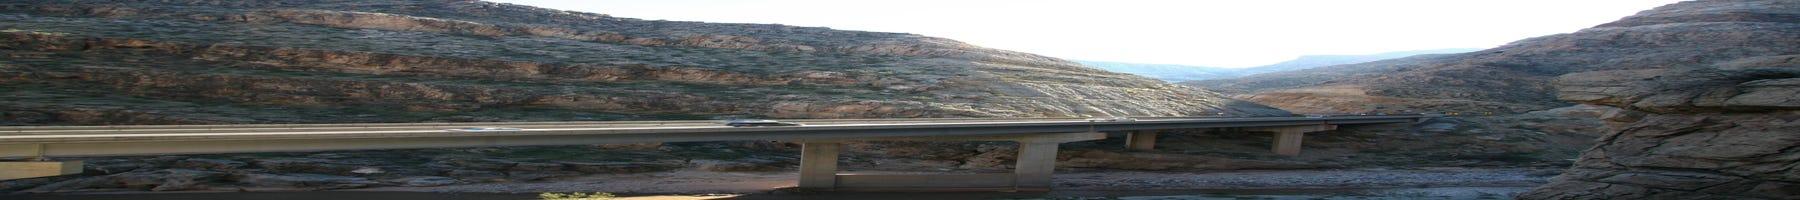 Lane openings in Gorge to give weekend travelers hope